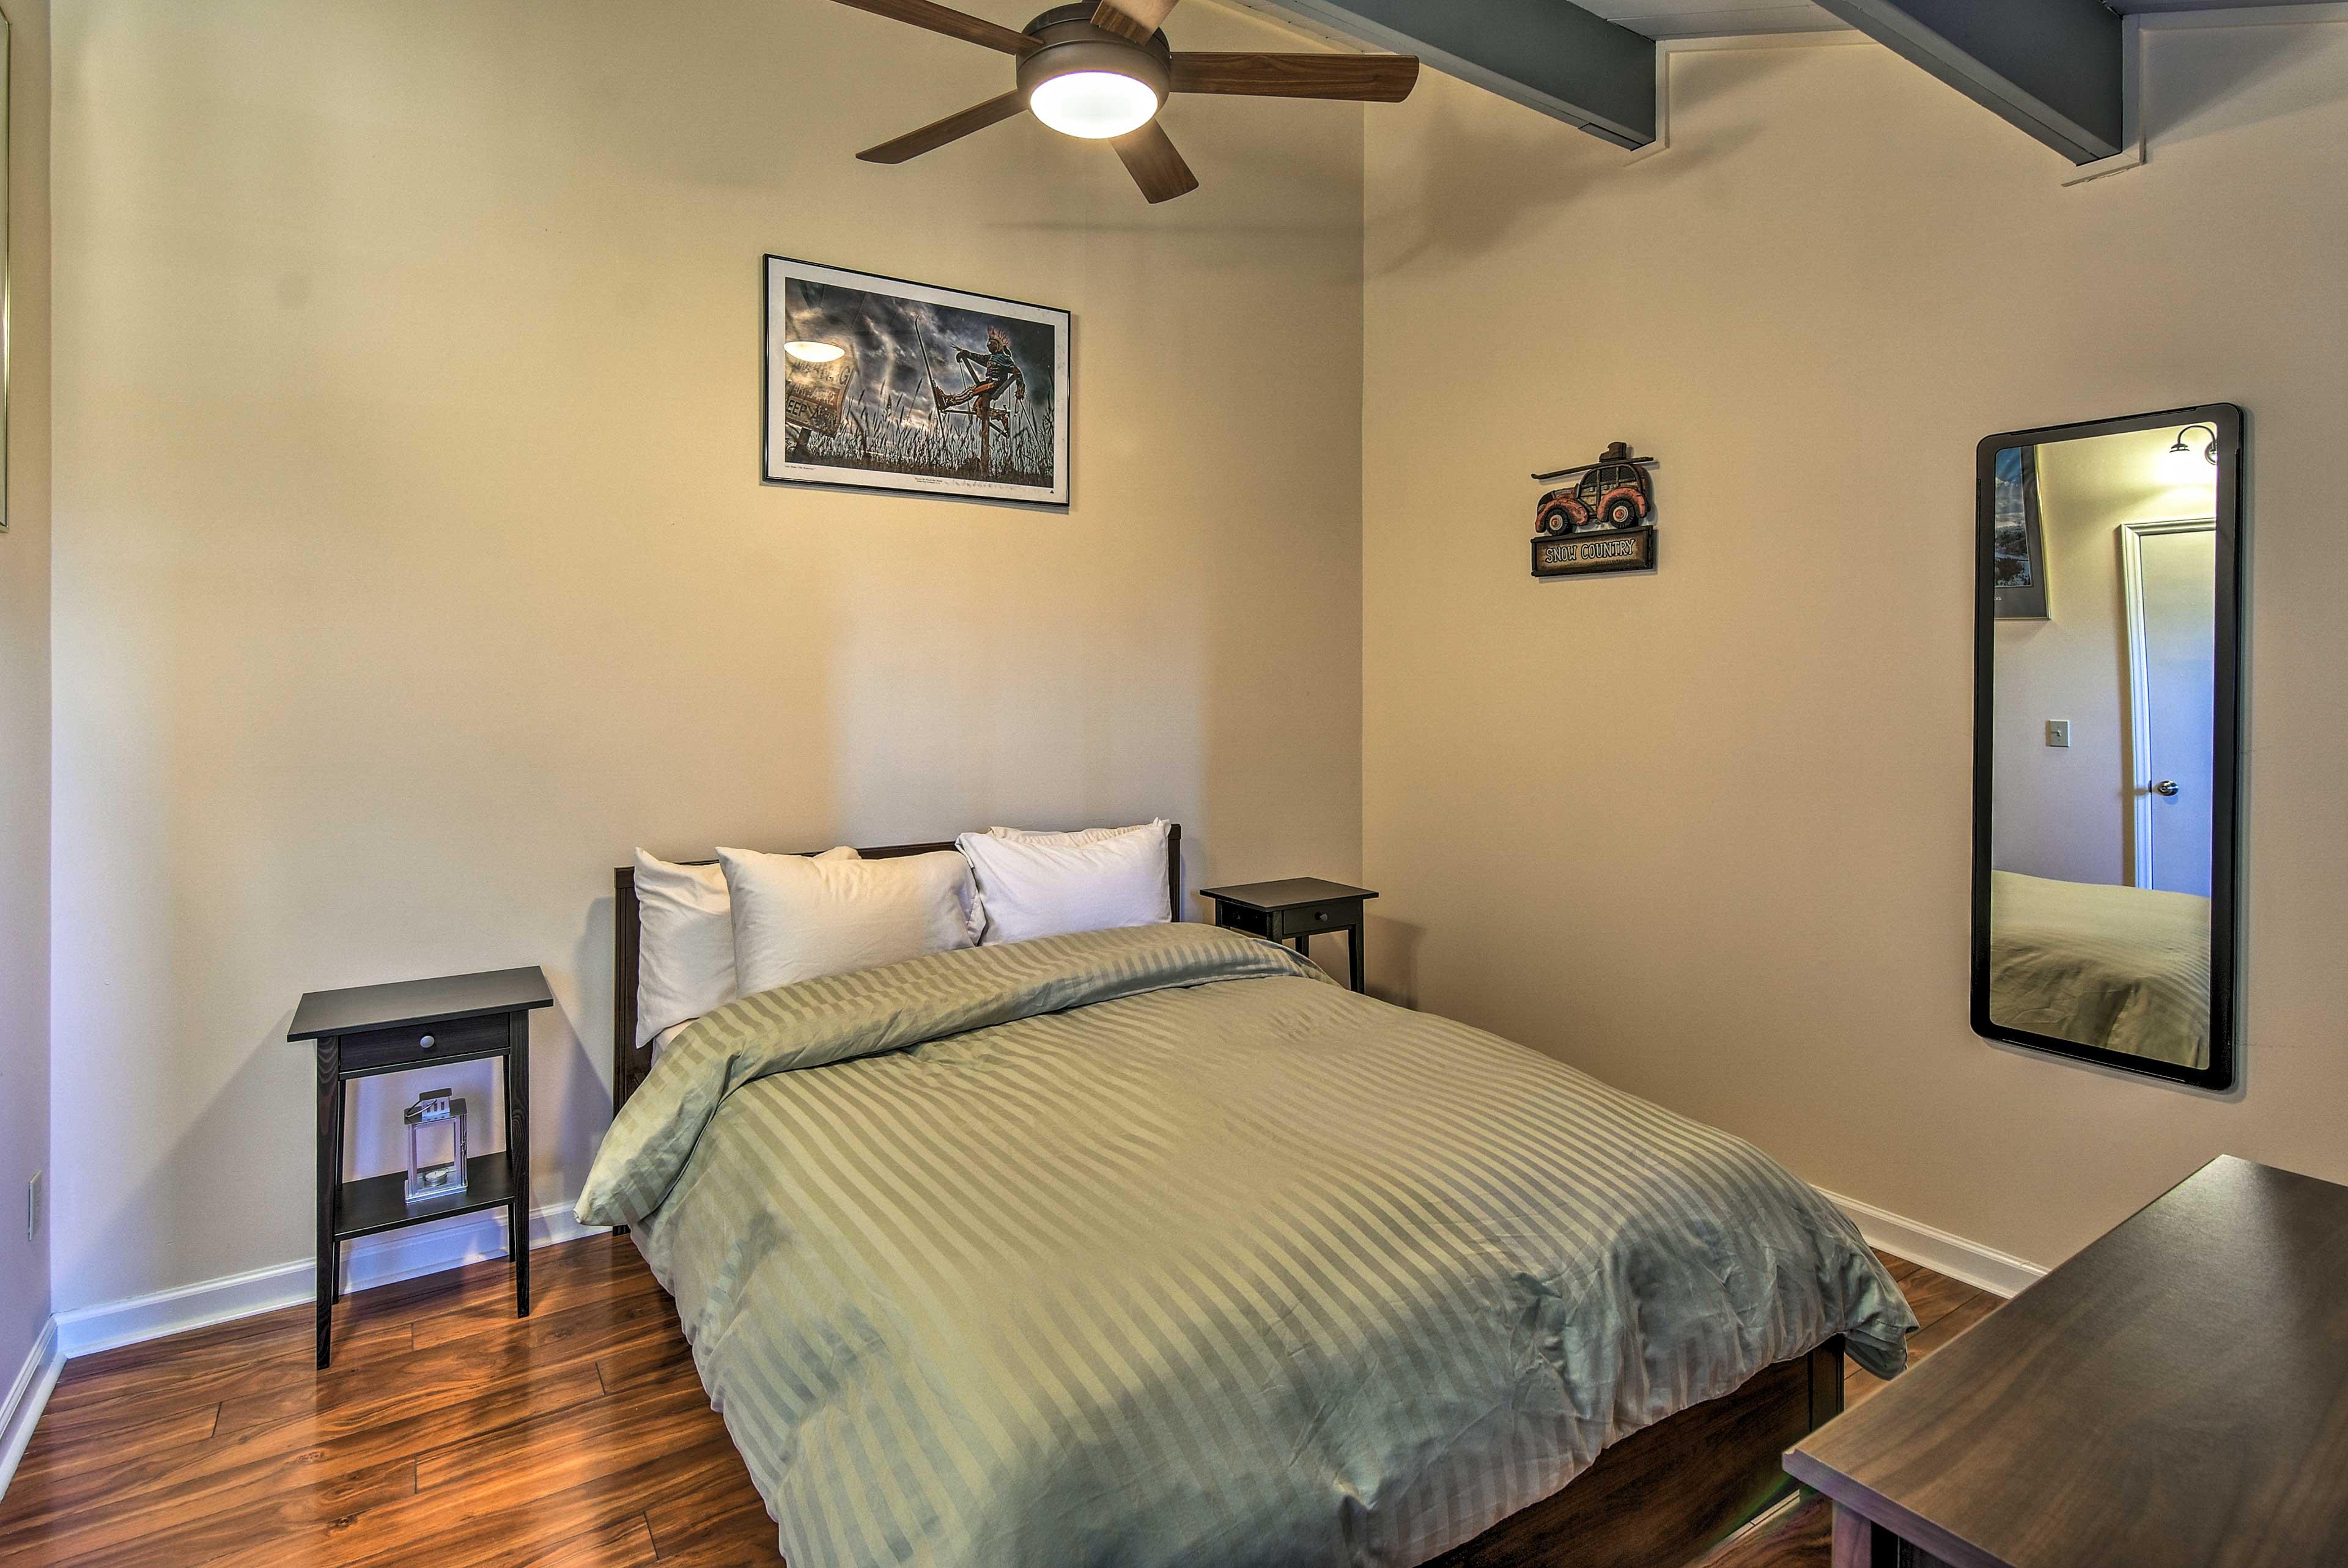 Climb under soft linen sheets for a tranquil slumber!